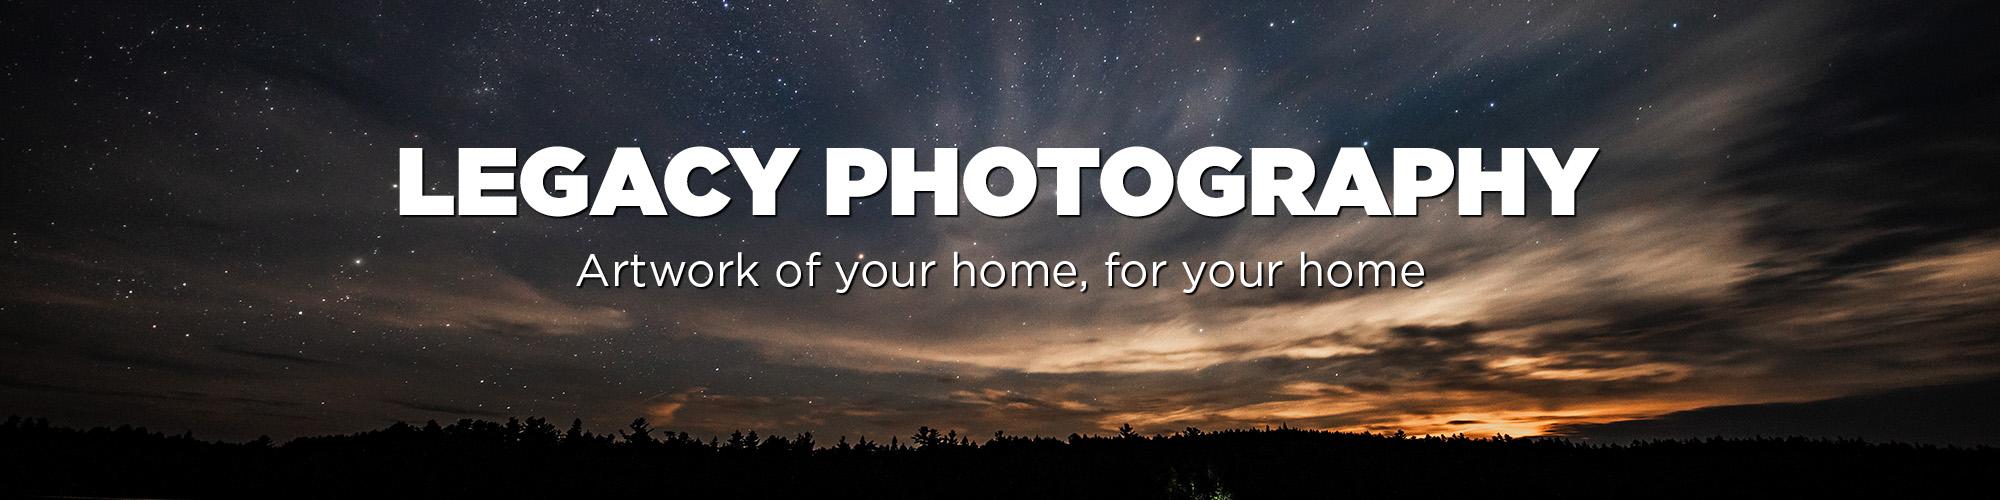 Banner_Legacy Photography.jpg